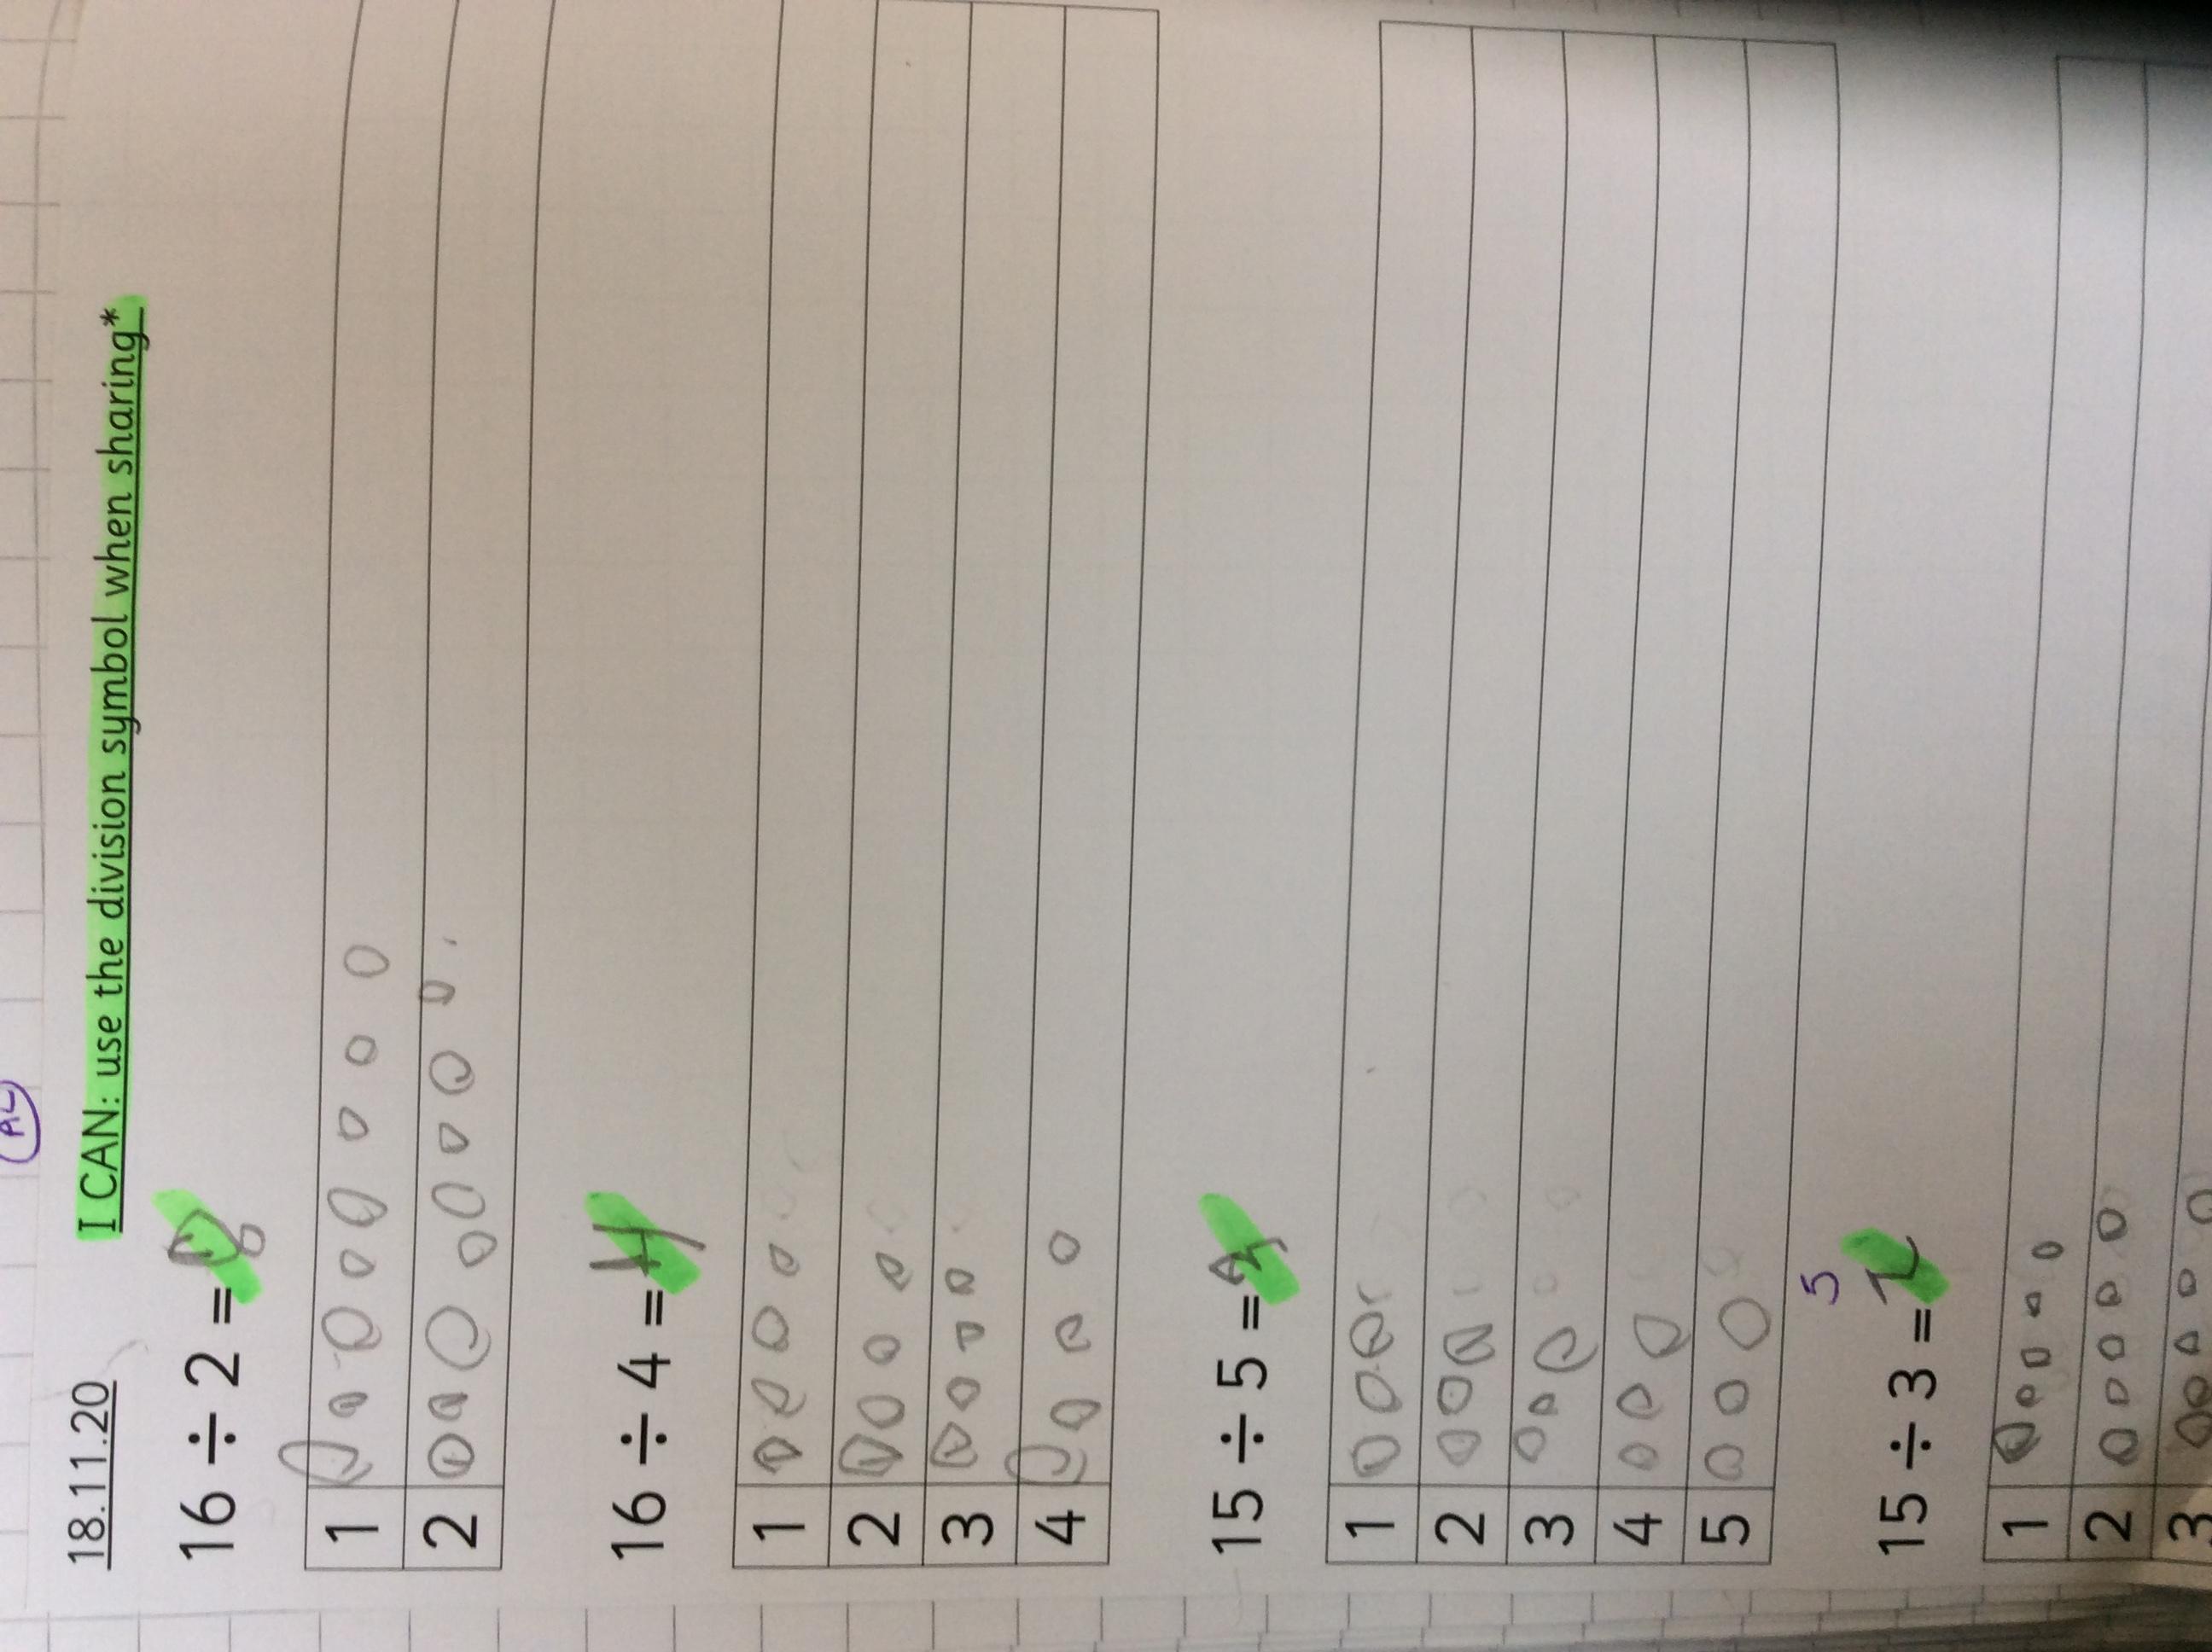 Jacob's wonderful maths!